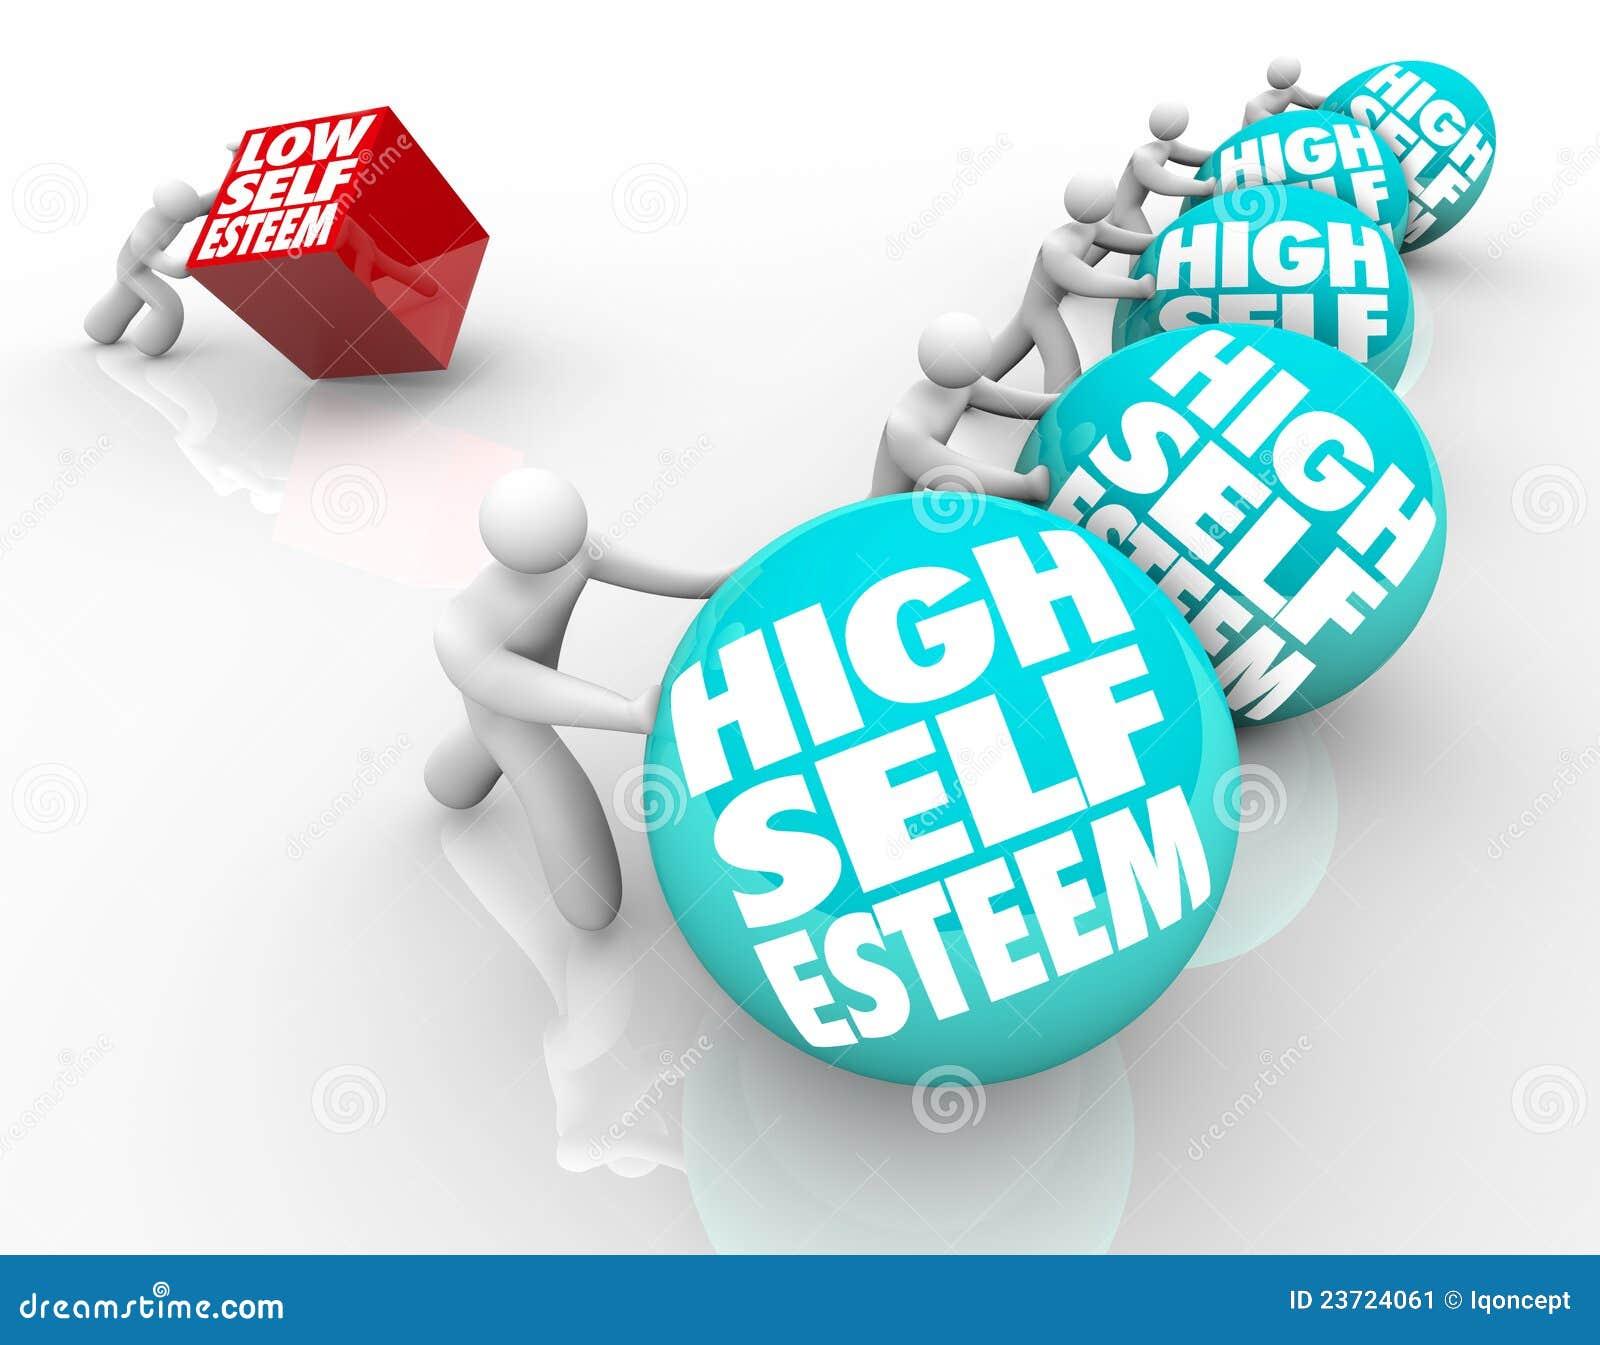 High Vs Low Self Esteem Losing Race of Confidence